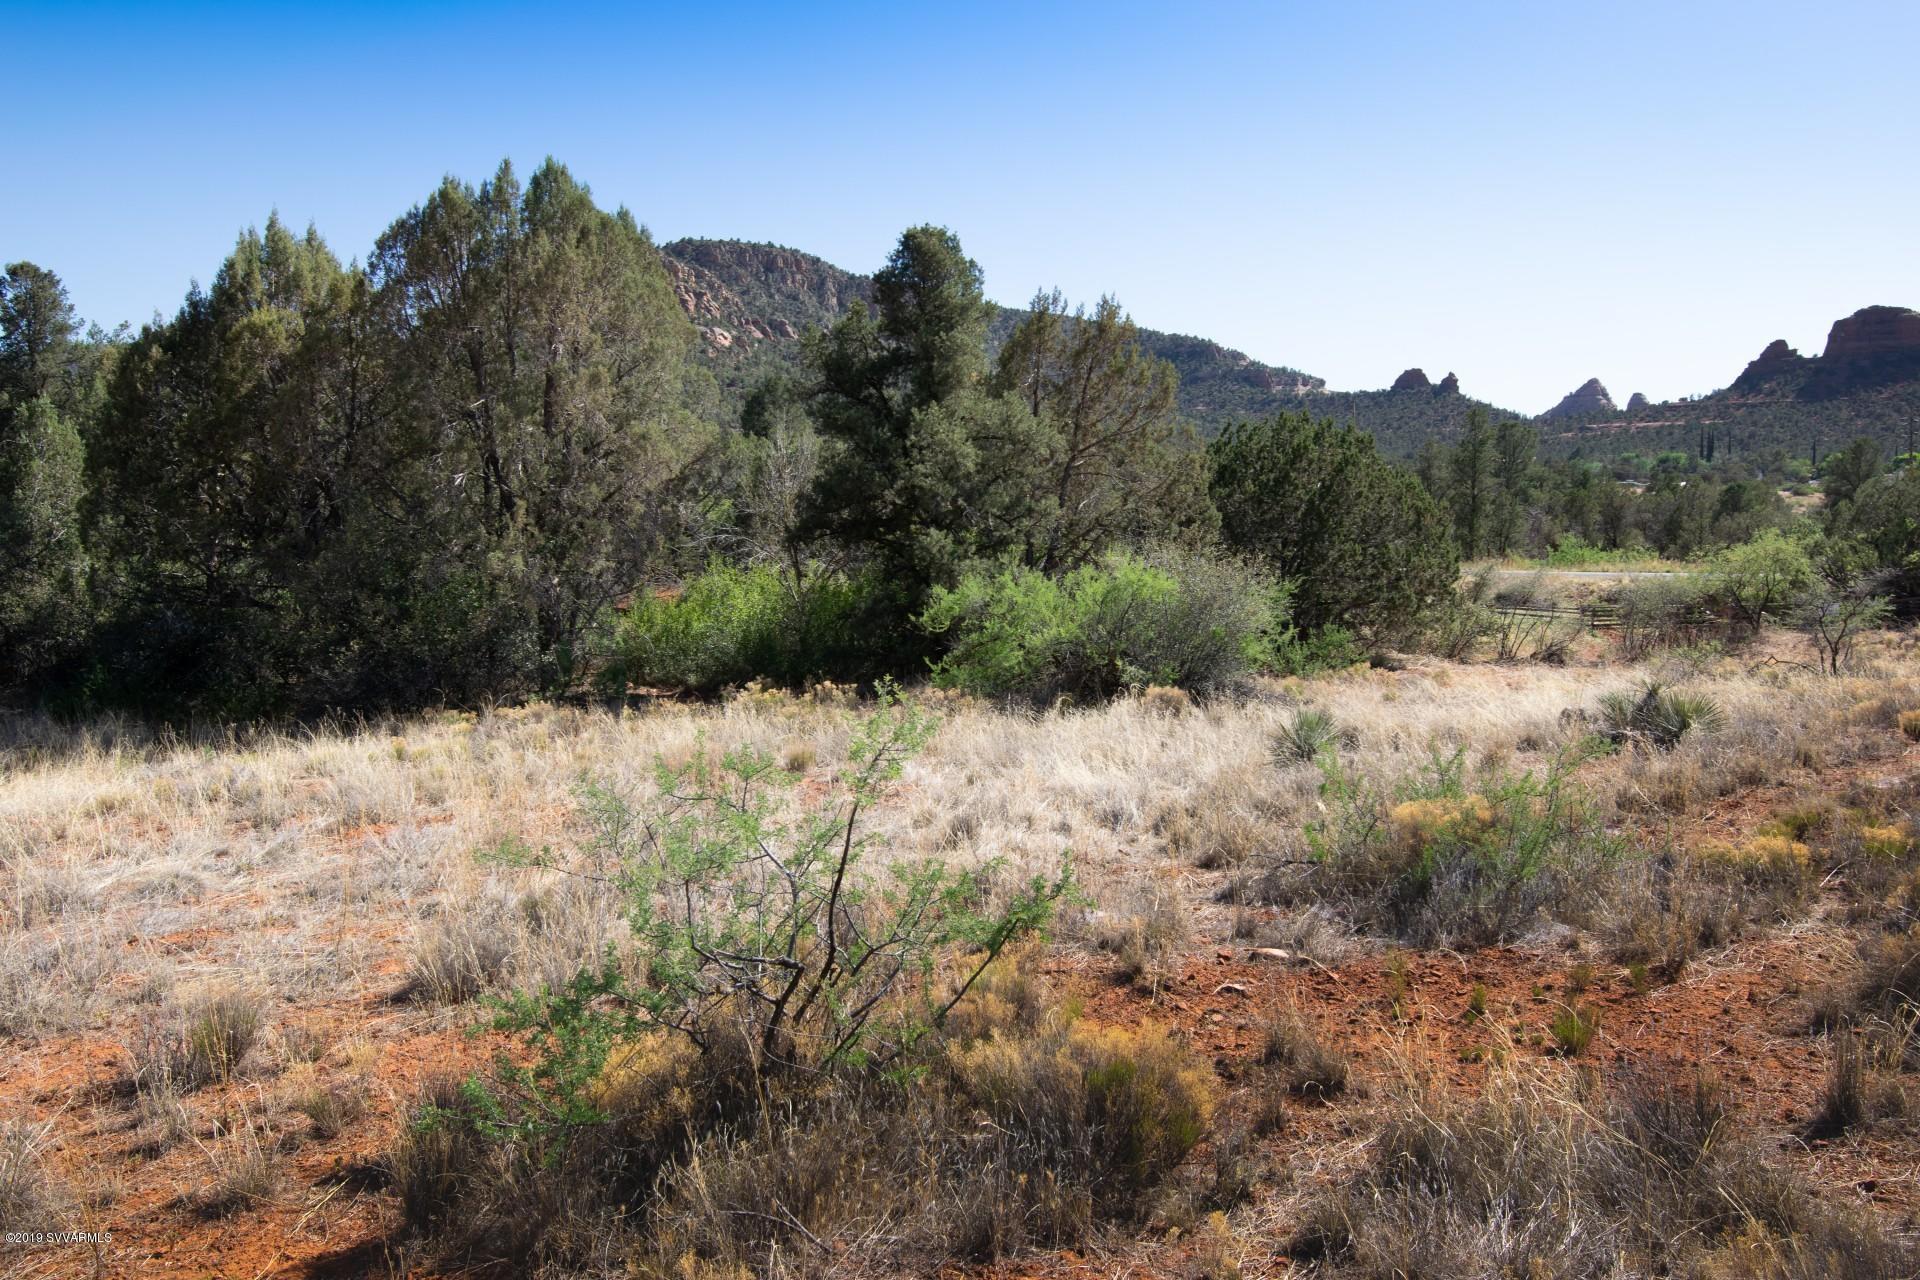 135 Agave Sedona, AZ 86351